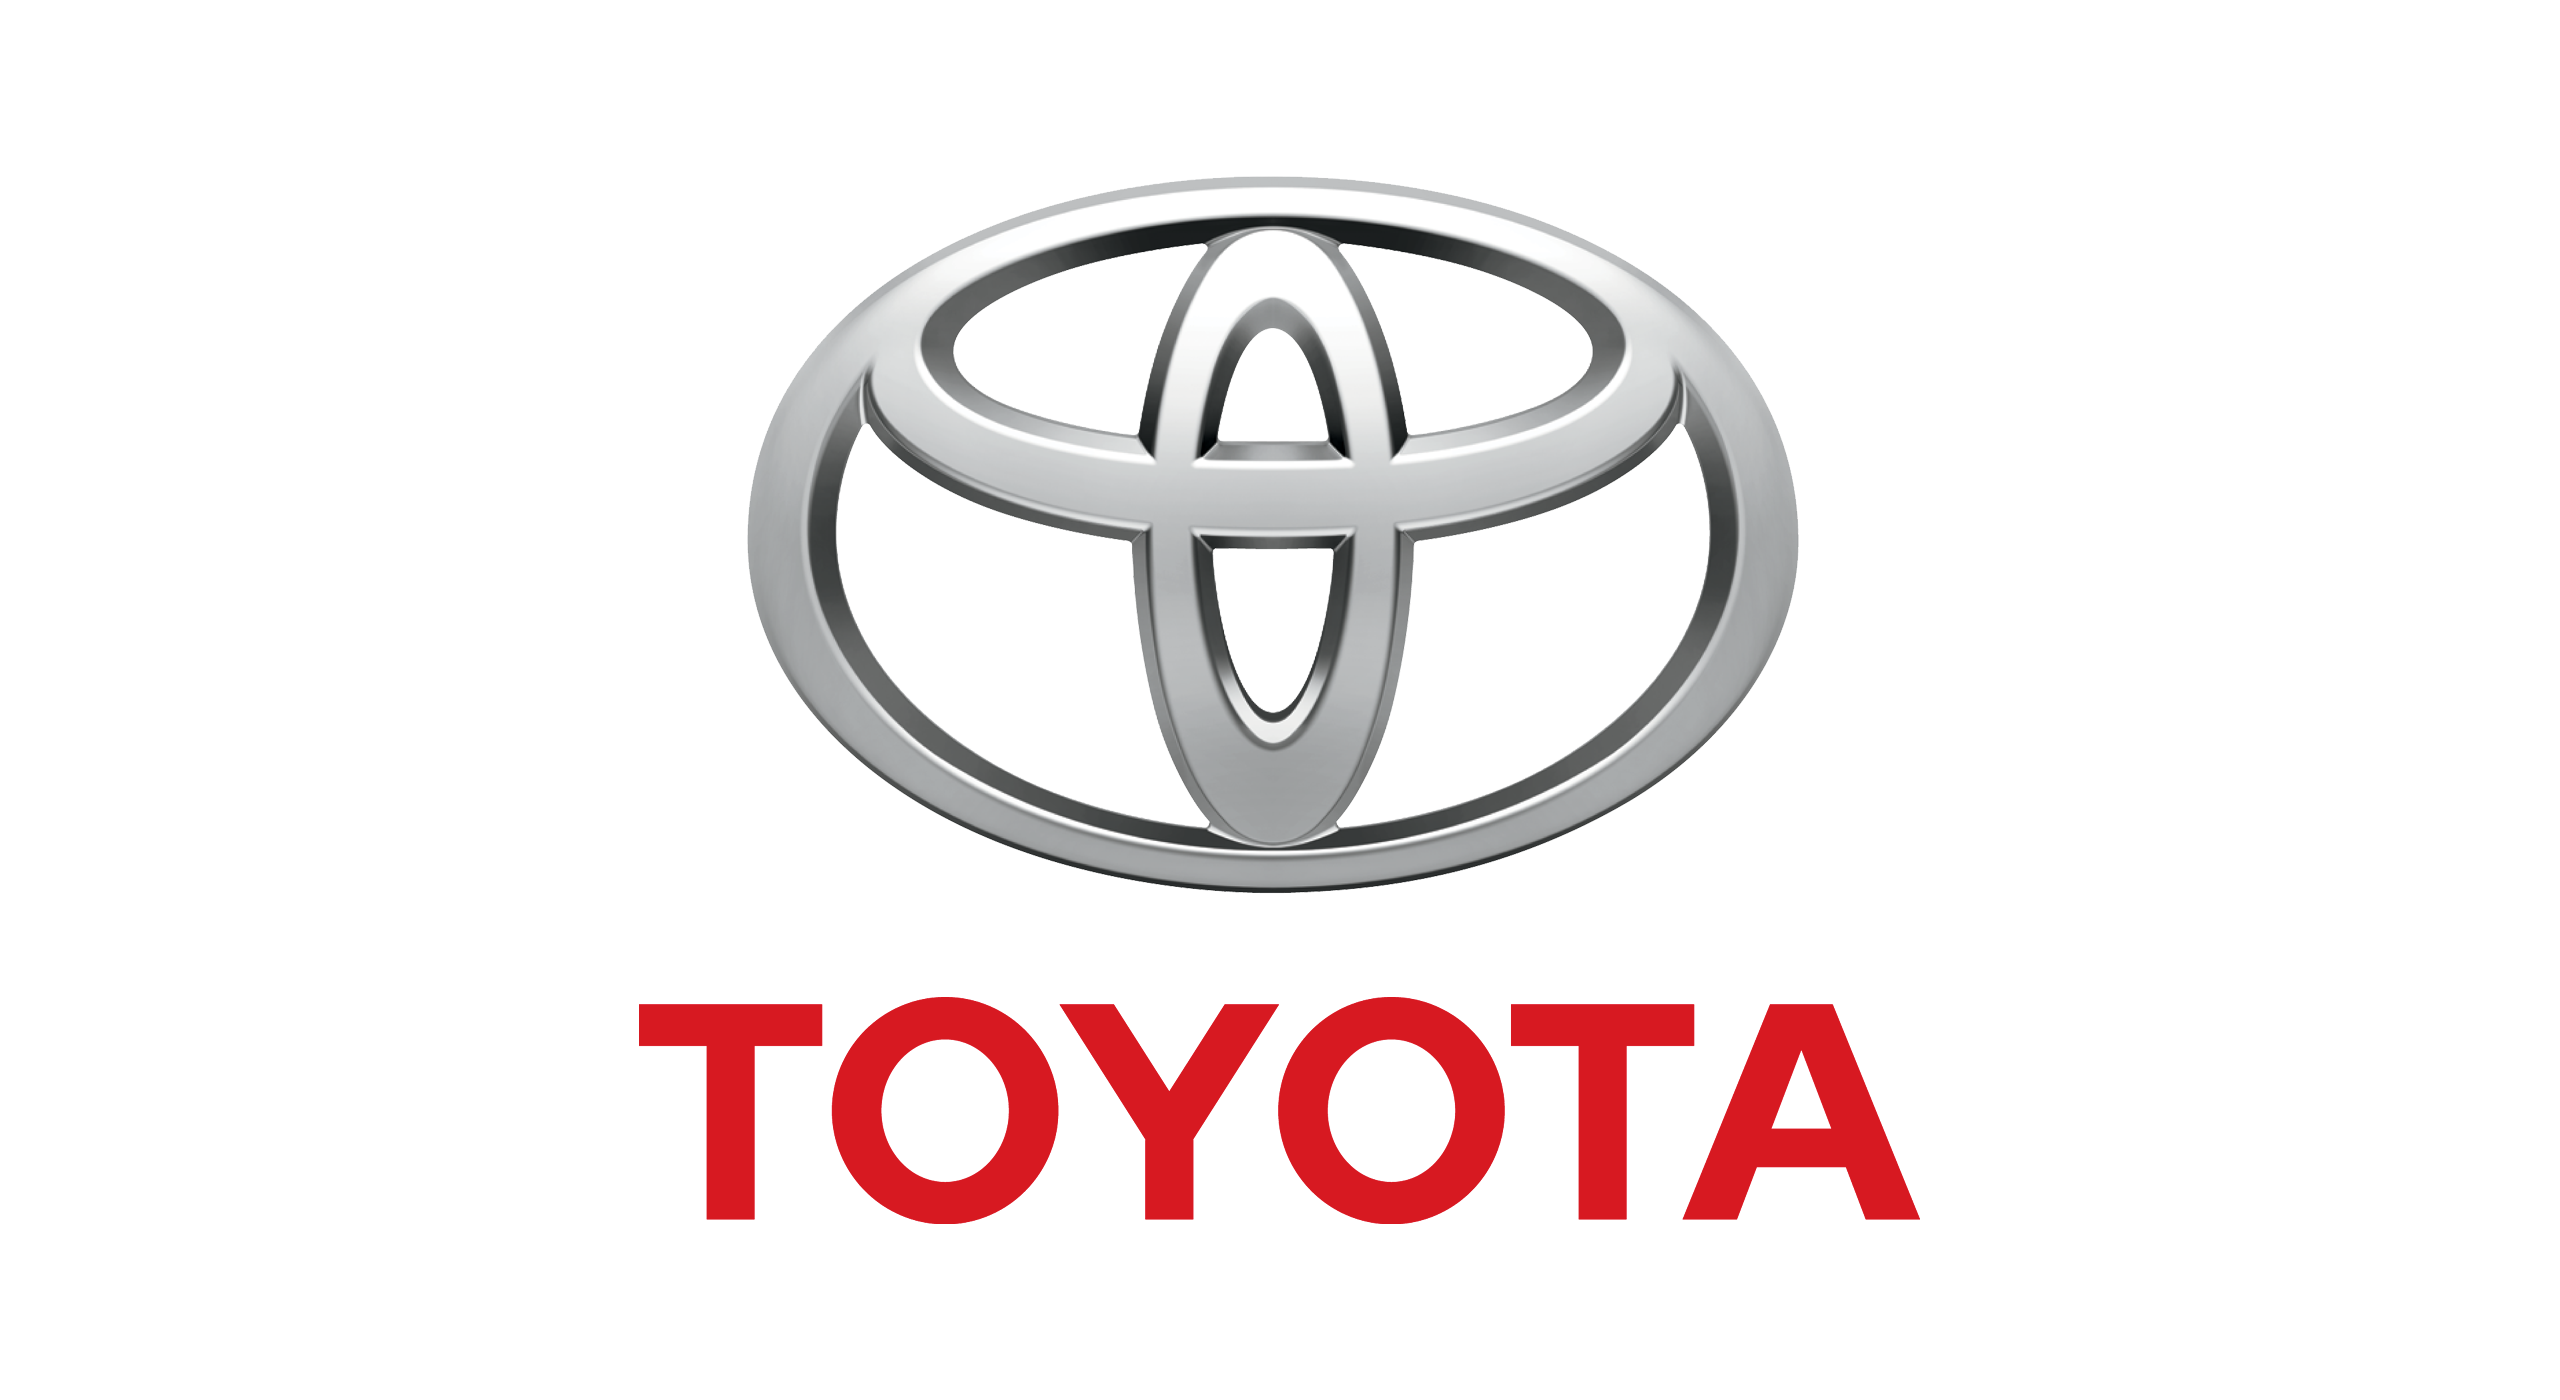 Toyota-logo-2560x1440